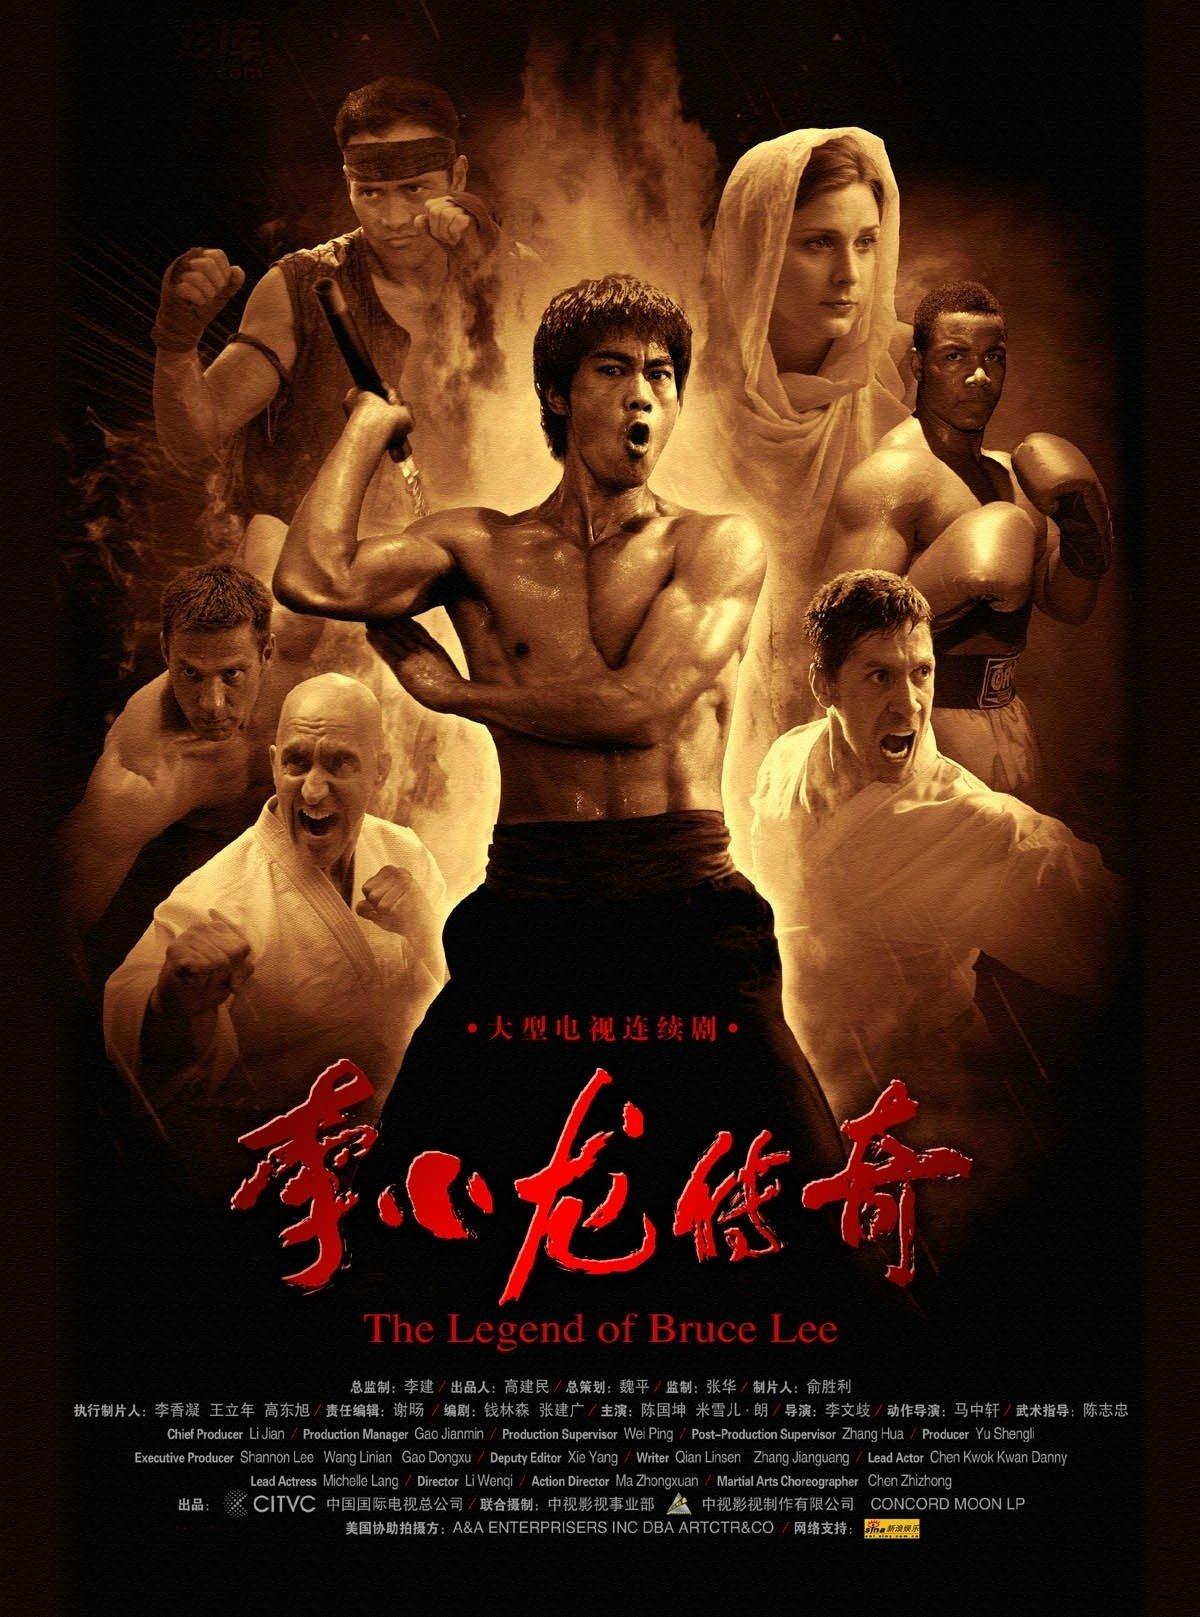 The legend of bruce lee martial arts film action film, png.